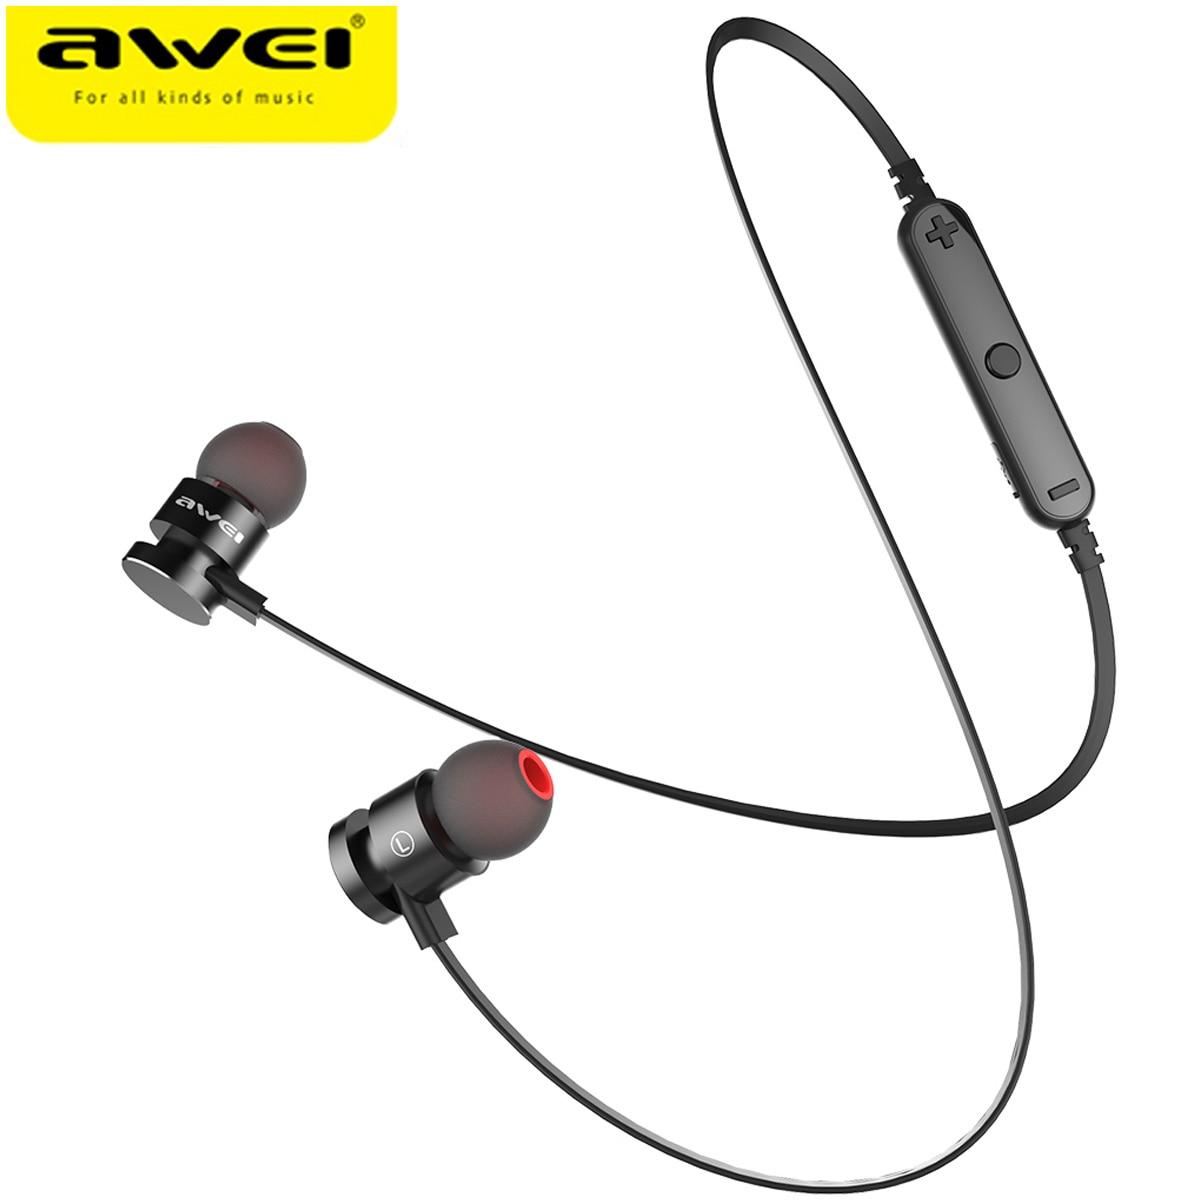 Neueste AWEI T11 Drahtlose Kopfhörer Bluetooth Kopfhörer Für Telefon Neckband sport kopfhörer Auriculare CSR Bluetooth V4.2